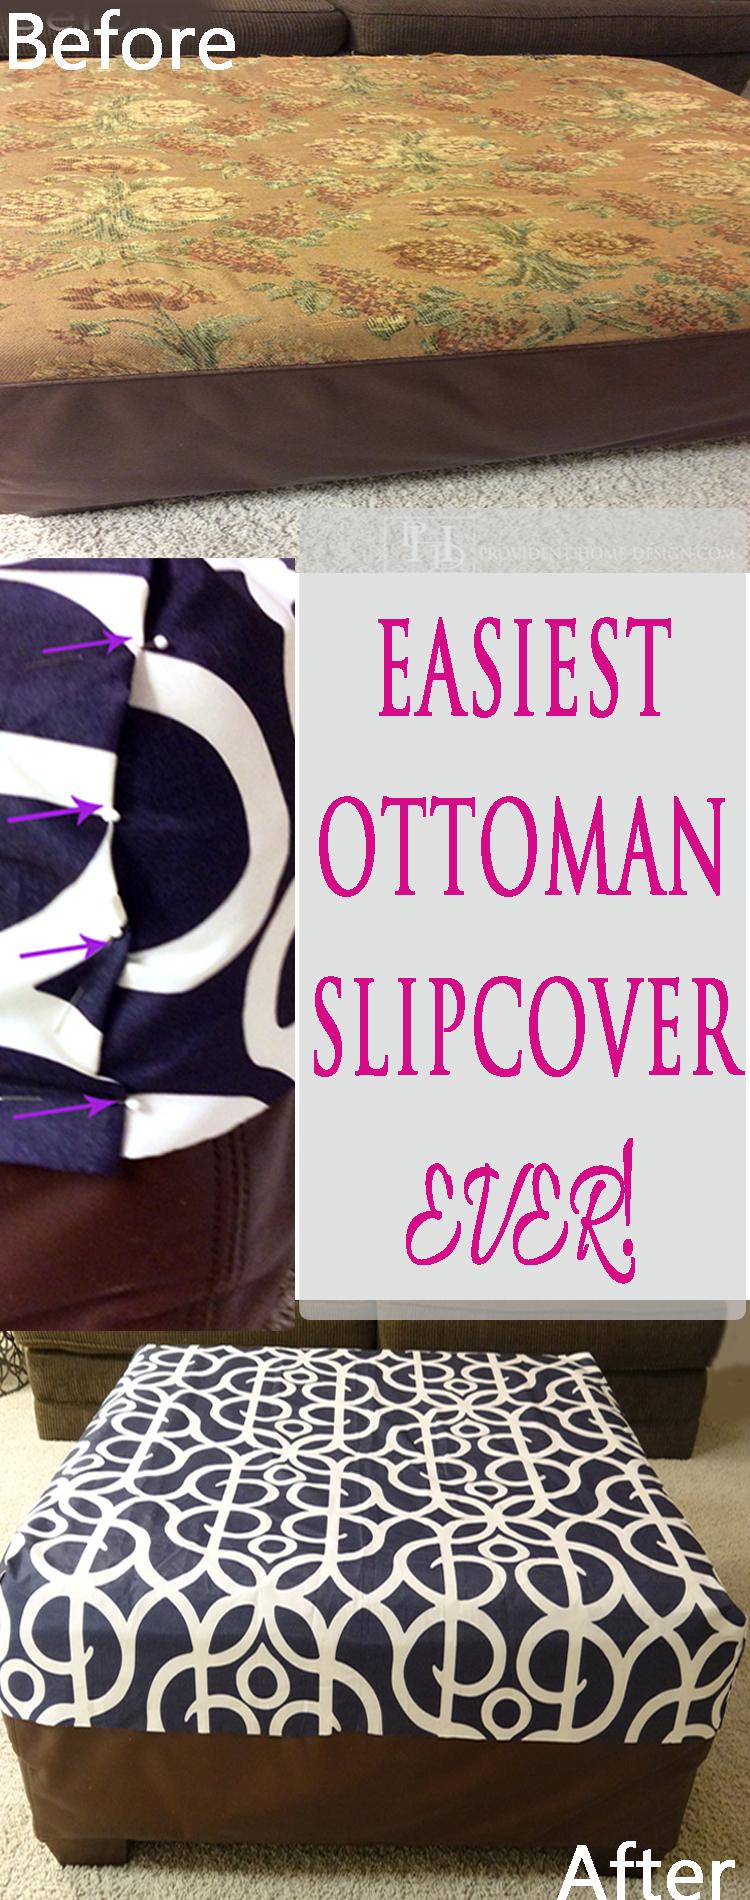 Easiest Ottoman Slipcover Ever